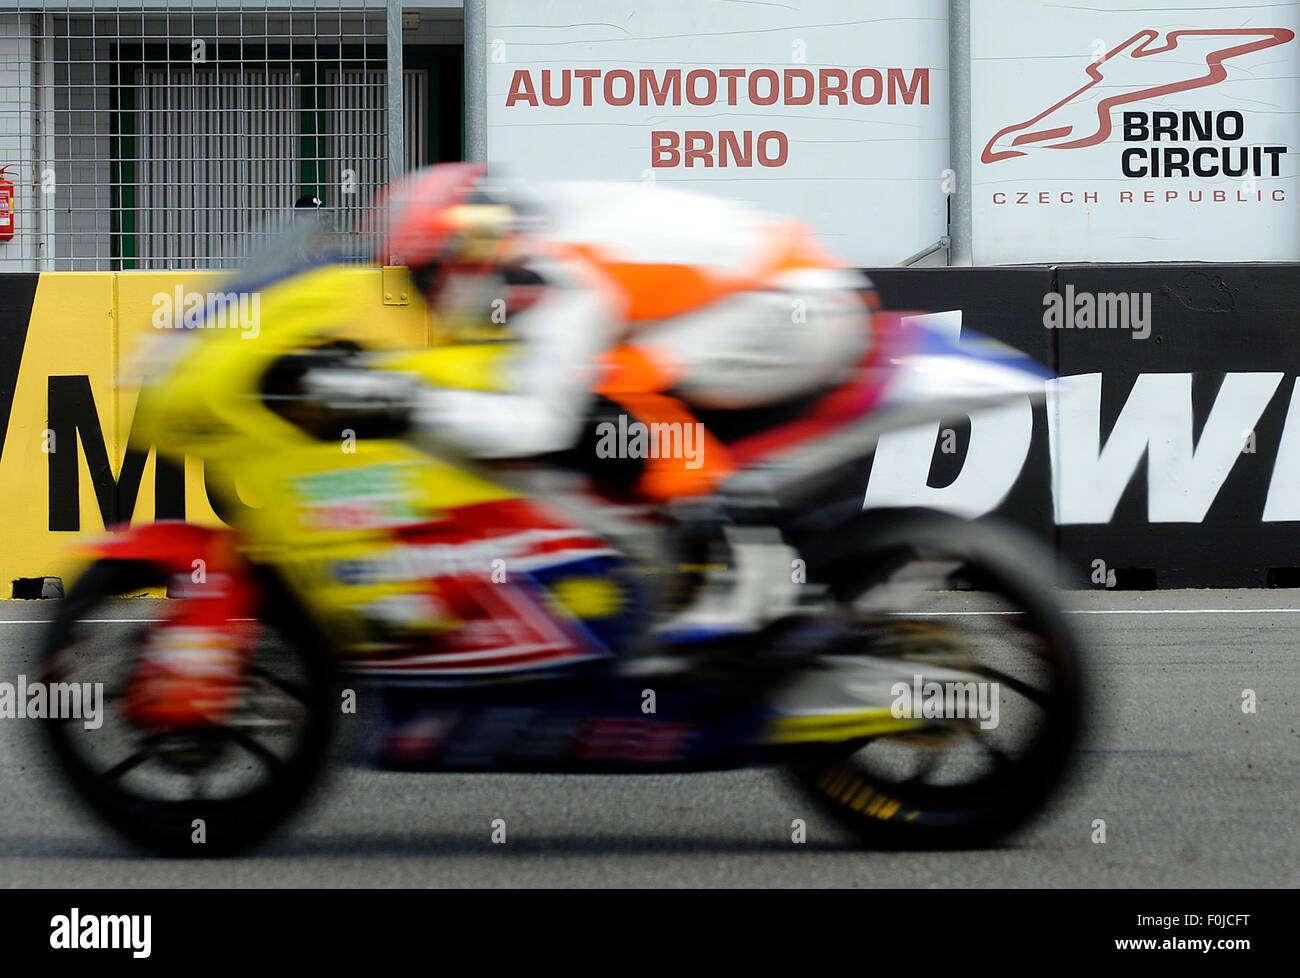 Brno, Czech Republic. 15th Aug, 2015. Grand Prix of the Czech Republic 2015, Moto2, qualification, Czech Republic, - Stock Image